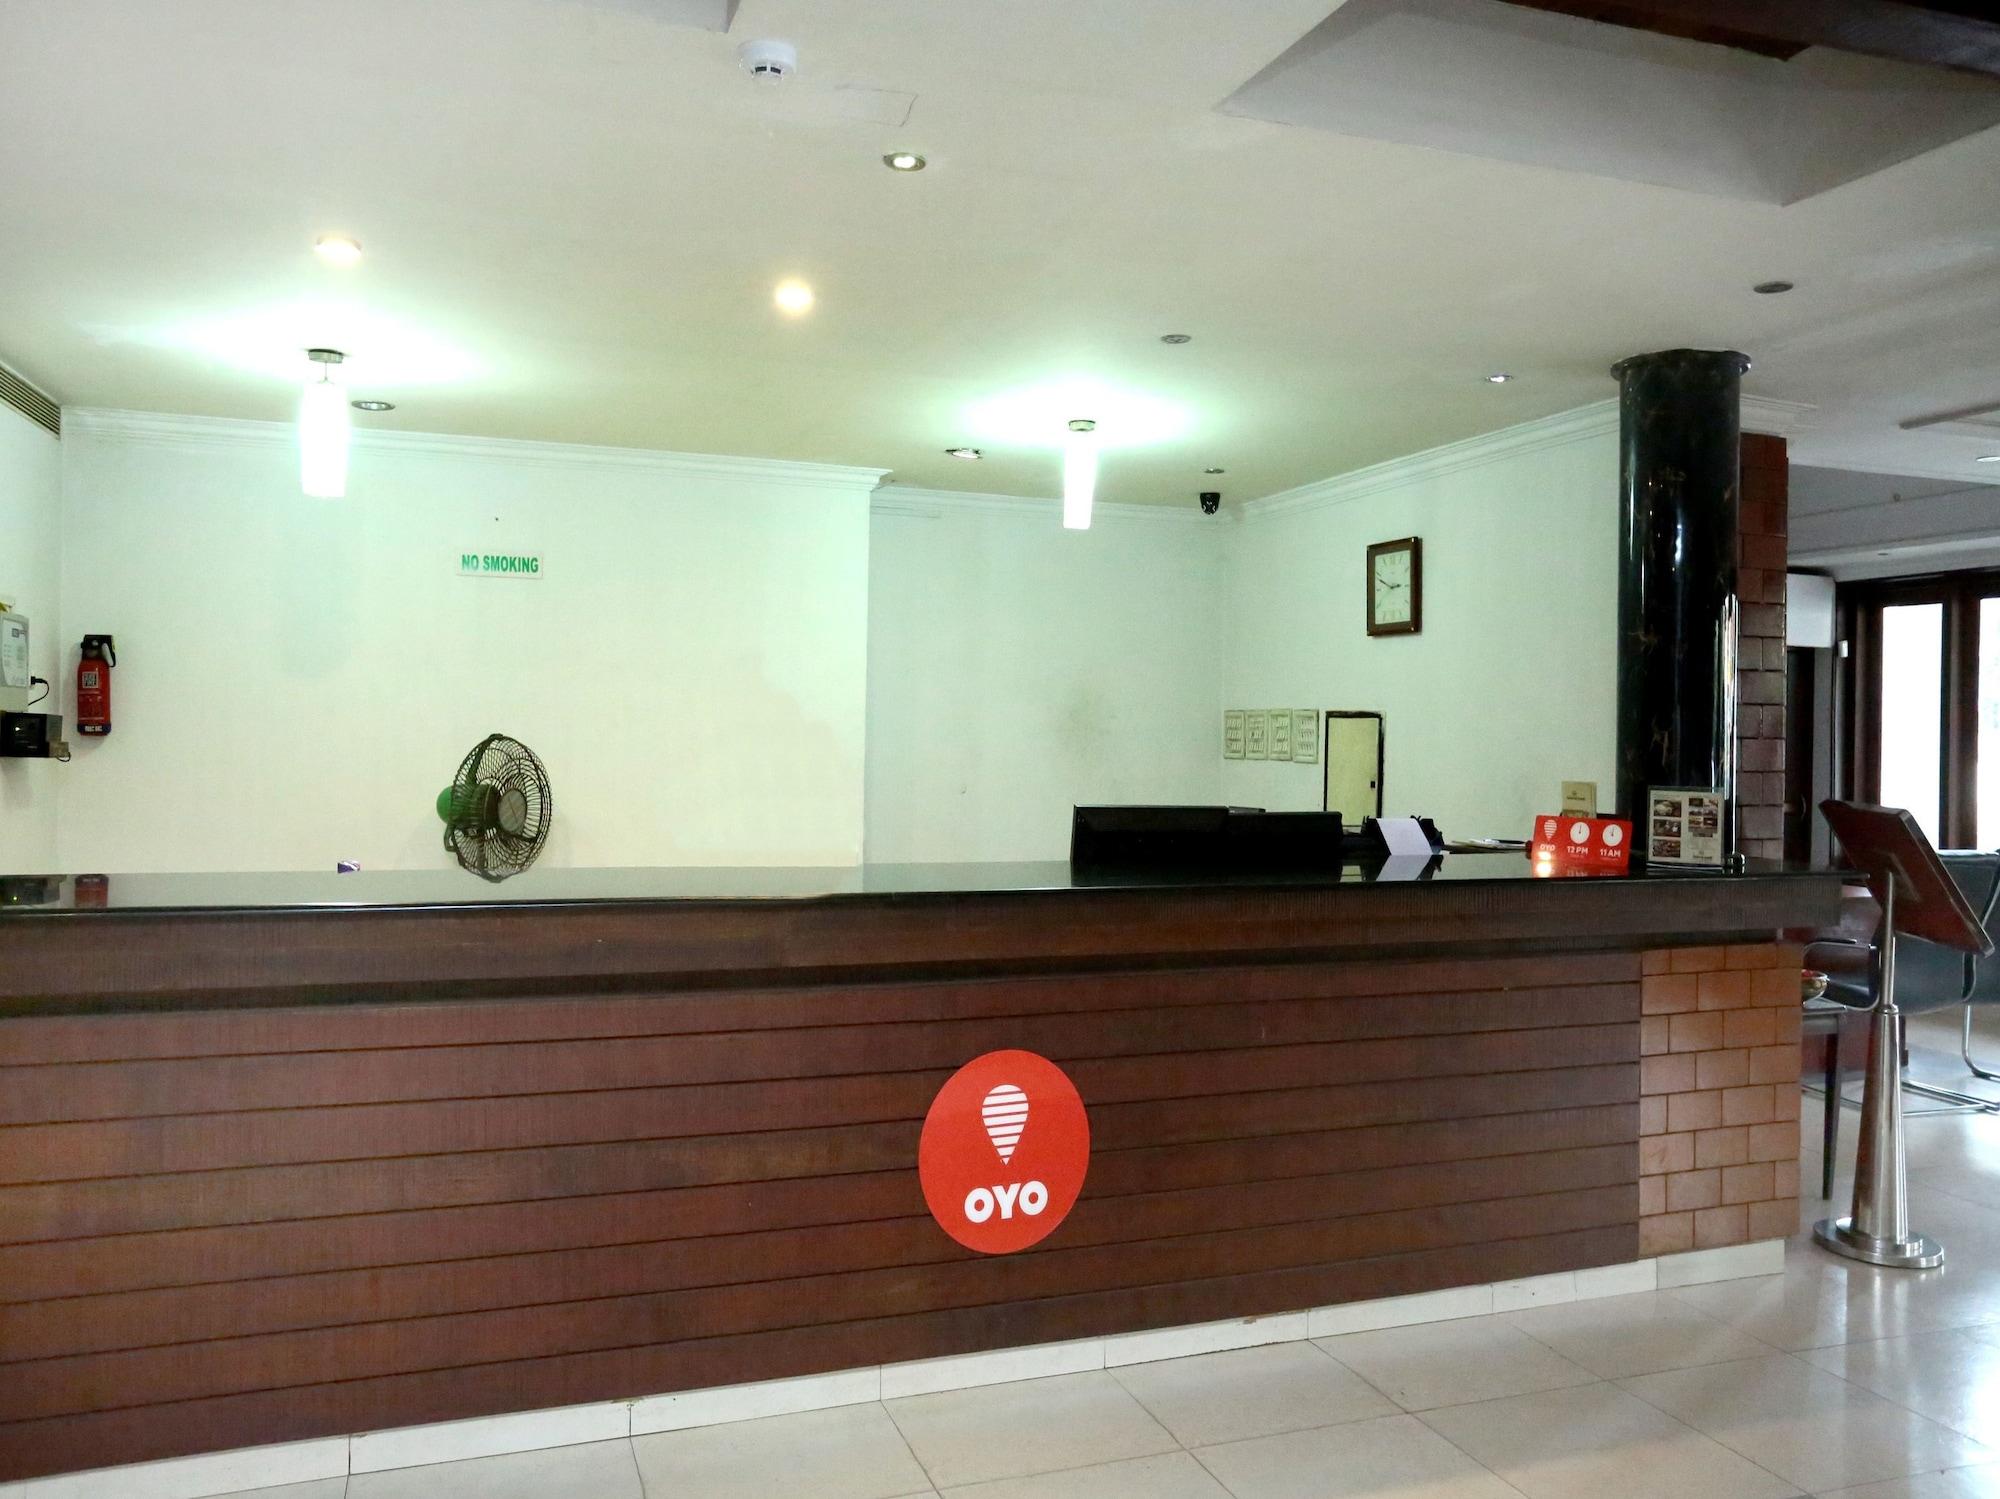 OYO 15992 Central Hotel, Thrissur